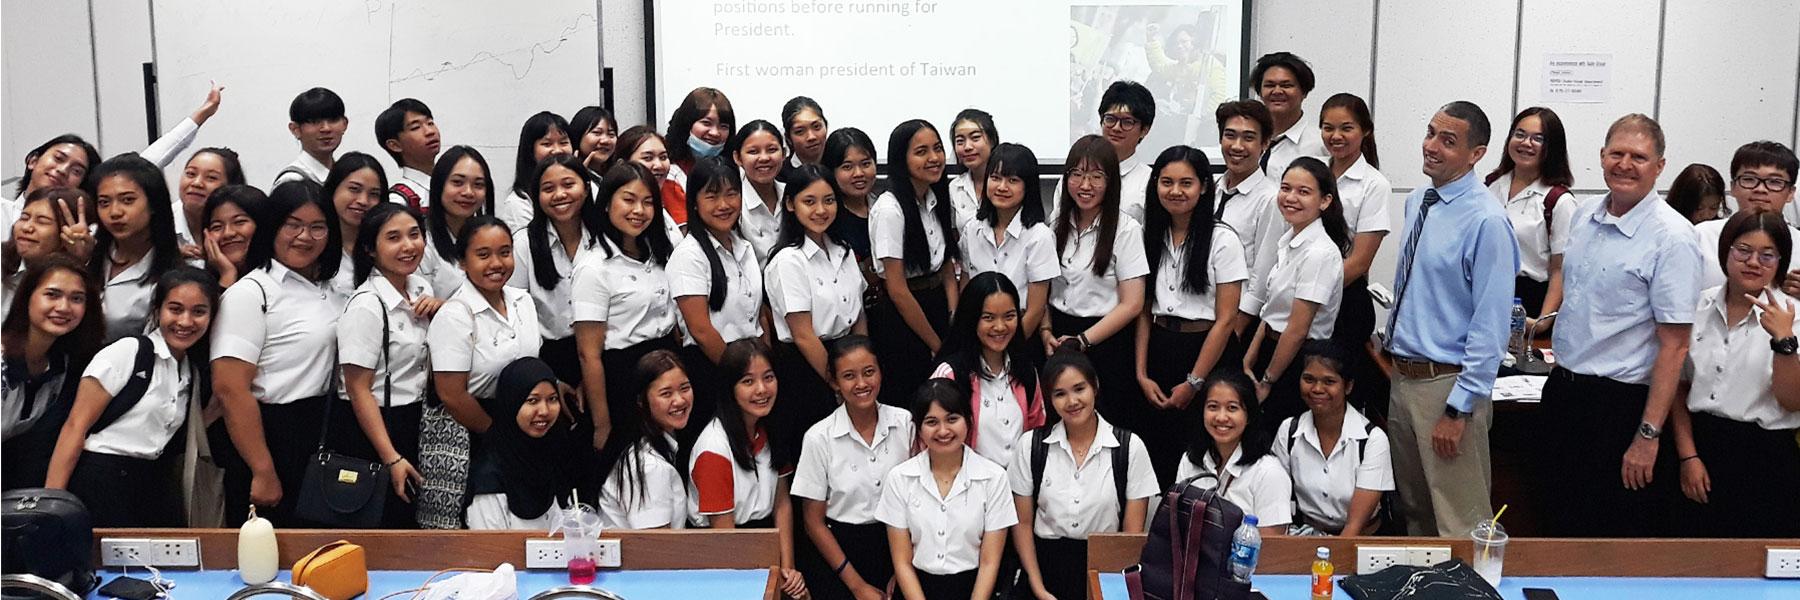 Taiwan Alumni Friends   Taiwan Scholarship   Dr Steven A Martin   Phuket Thailand Teaching